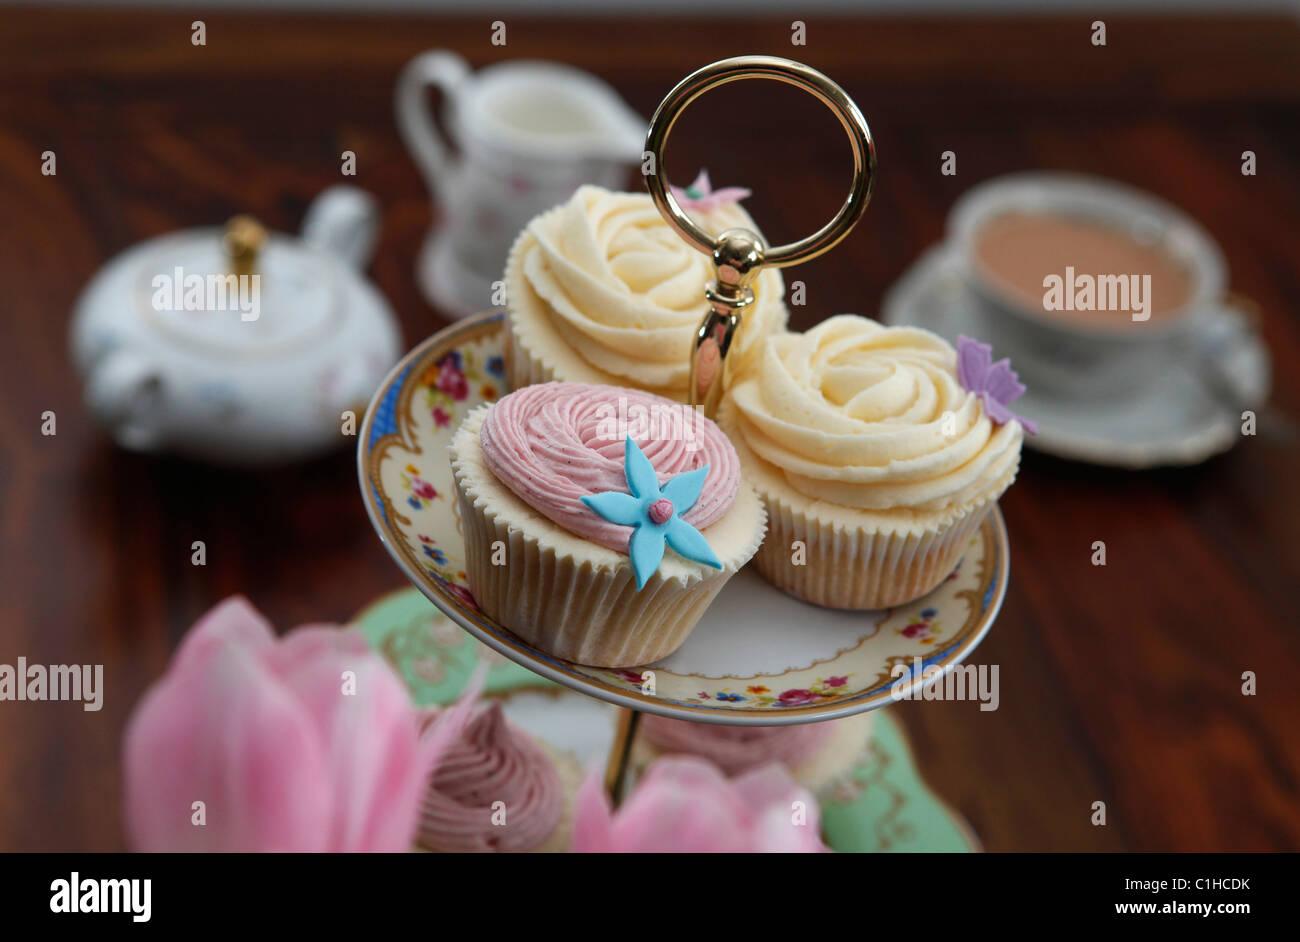 Cupcake - Stock Image